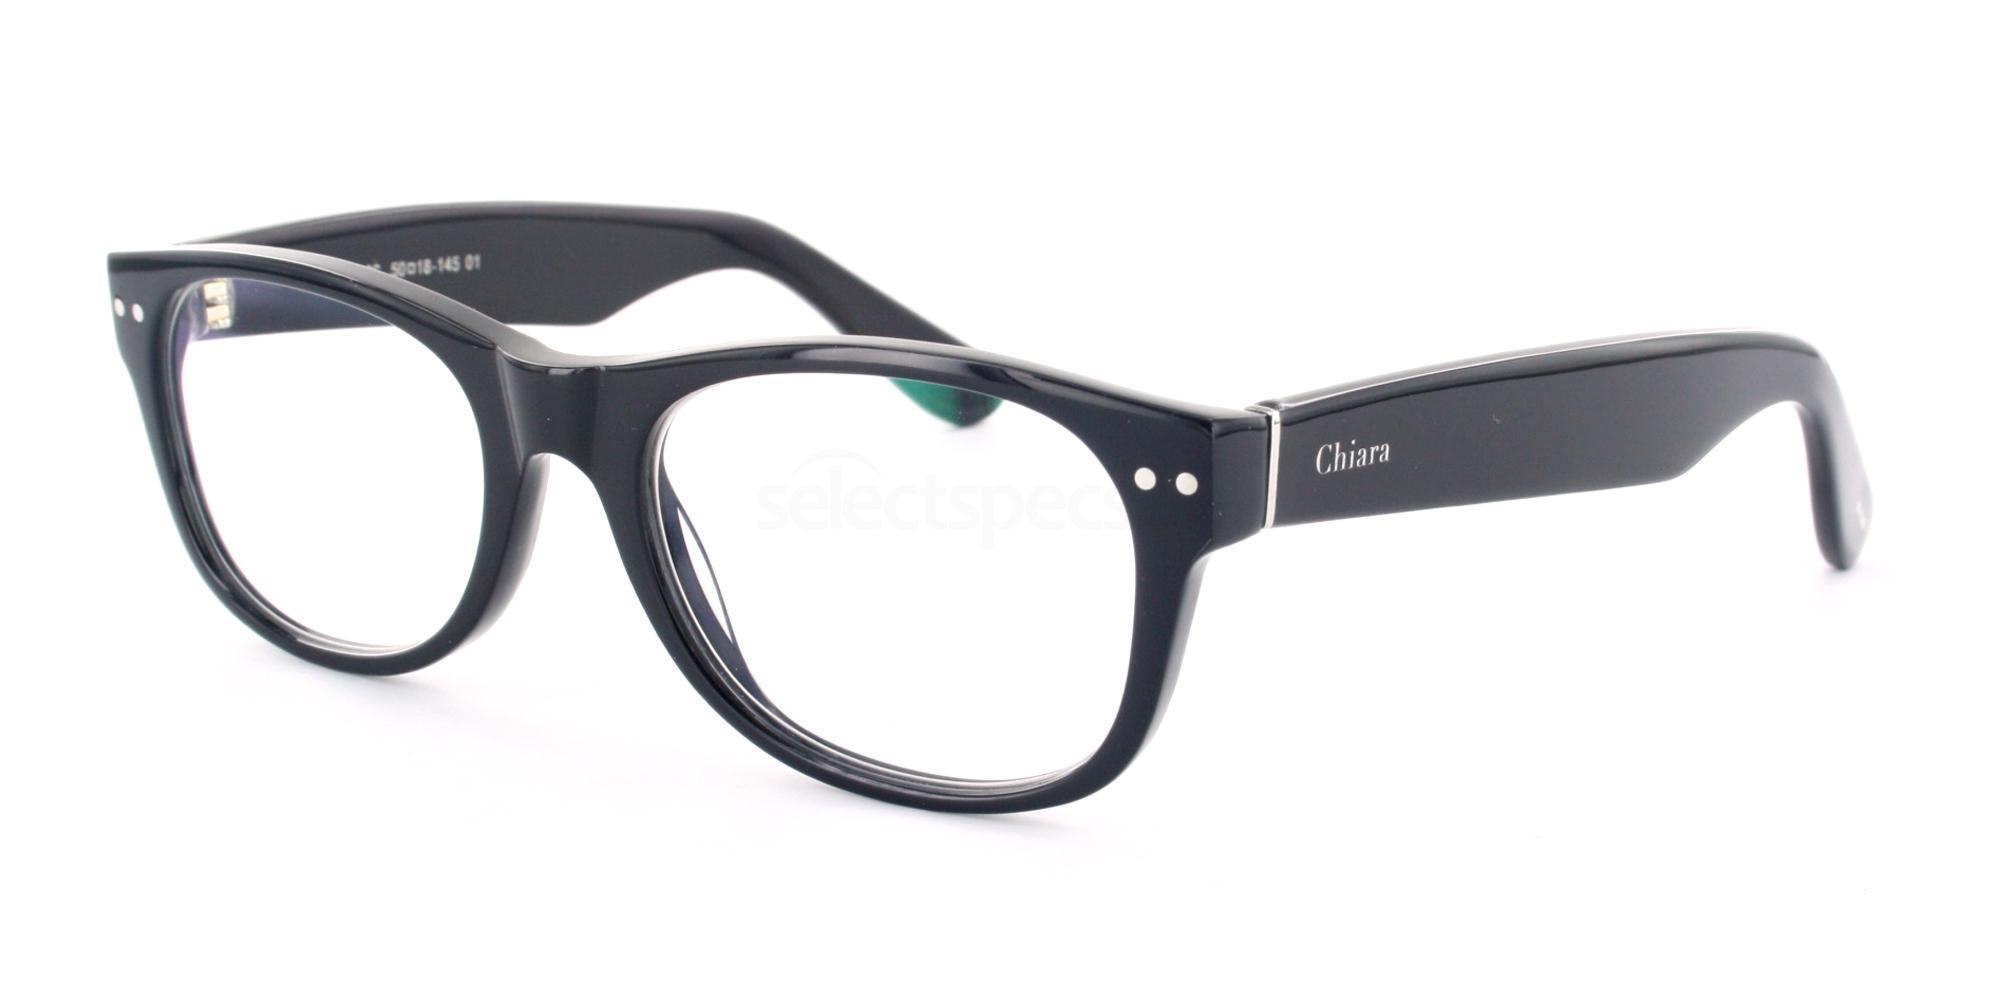 01 UCV1006 Glasses, Chiara Visione